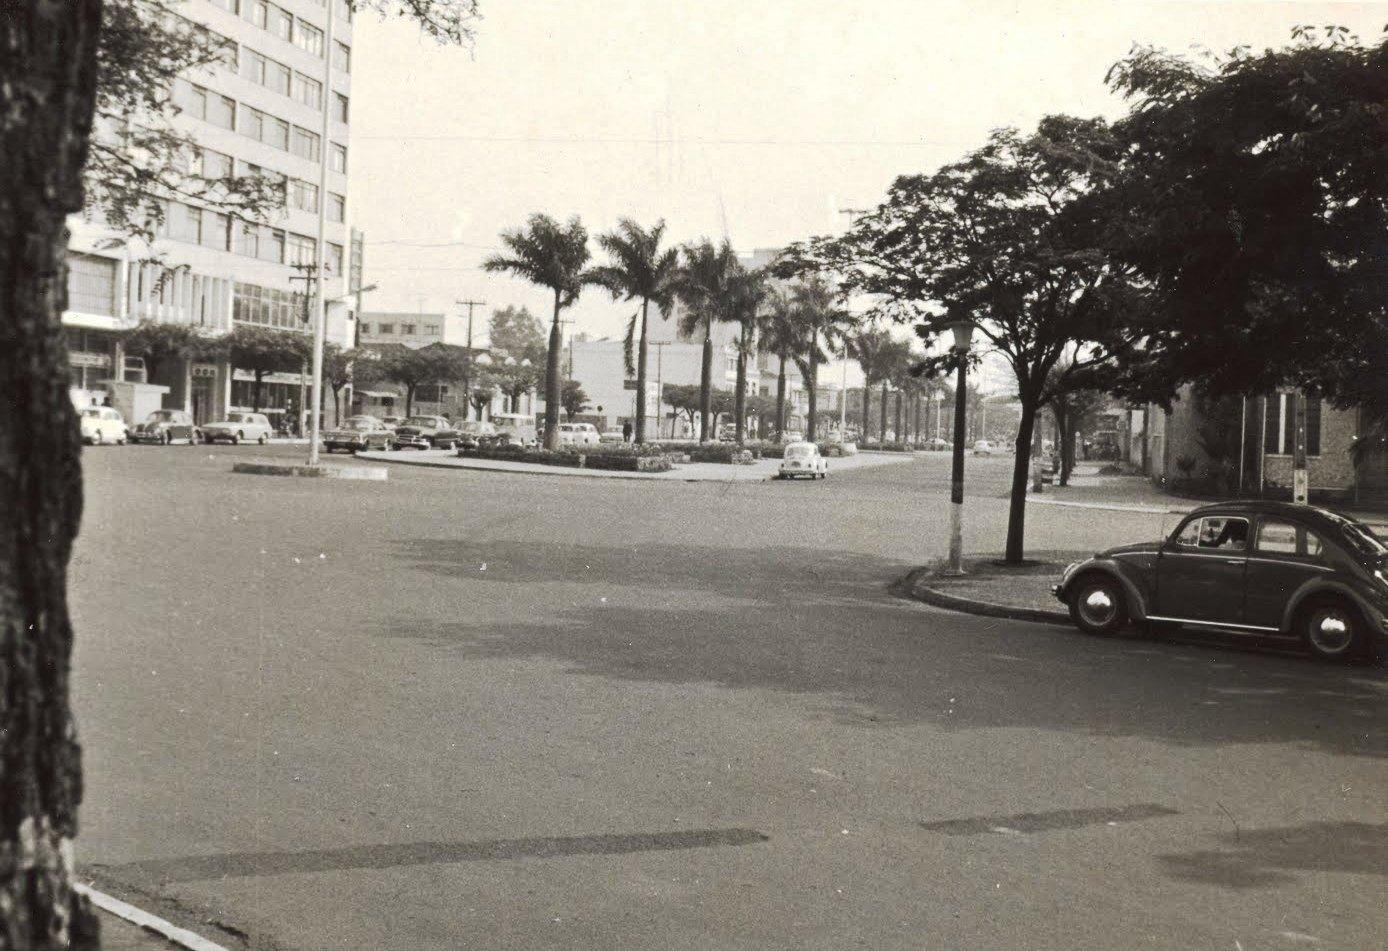 Avenida Getúlio Vargas - Década de 1970